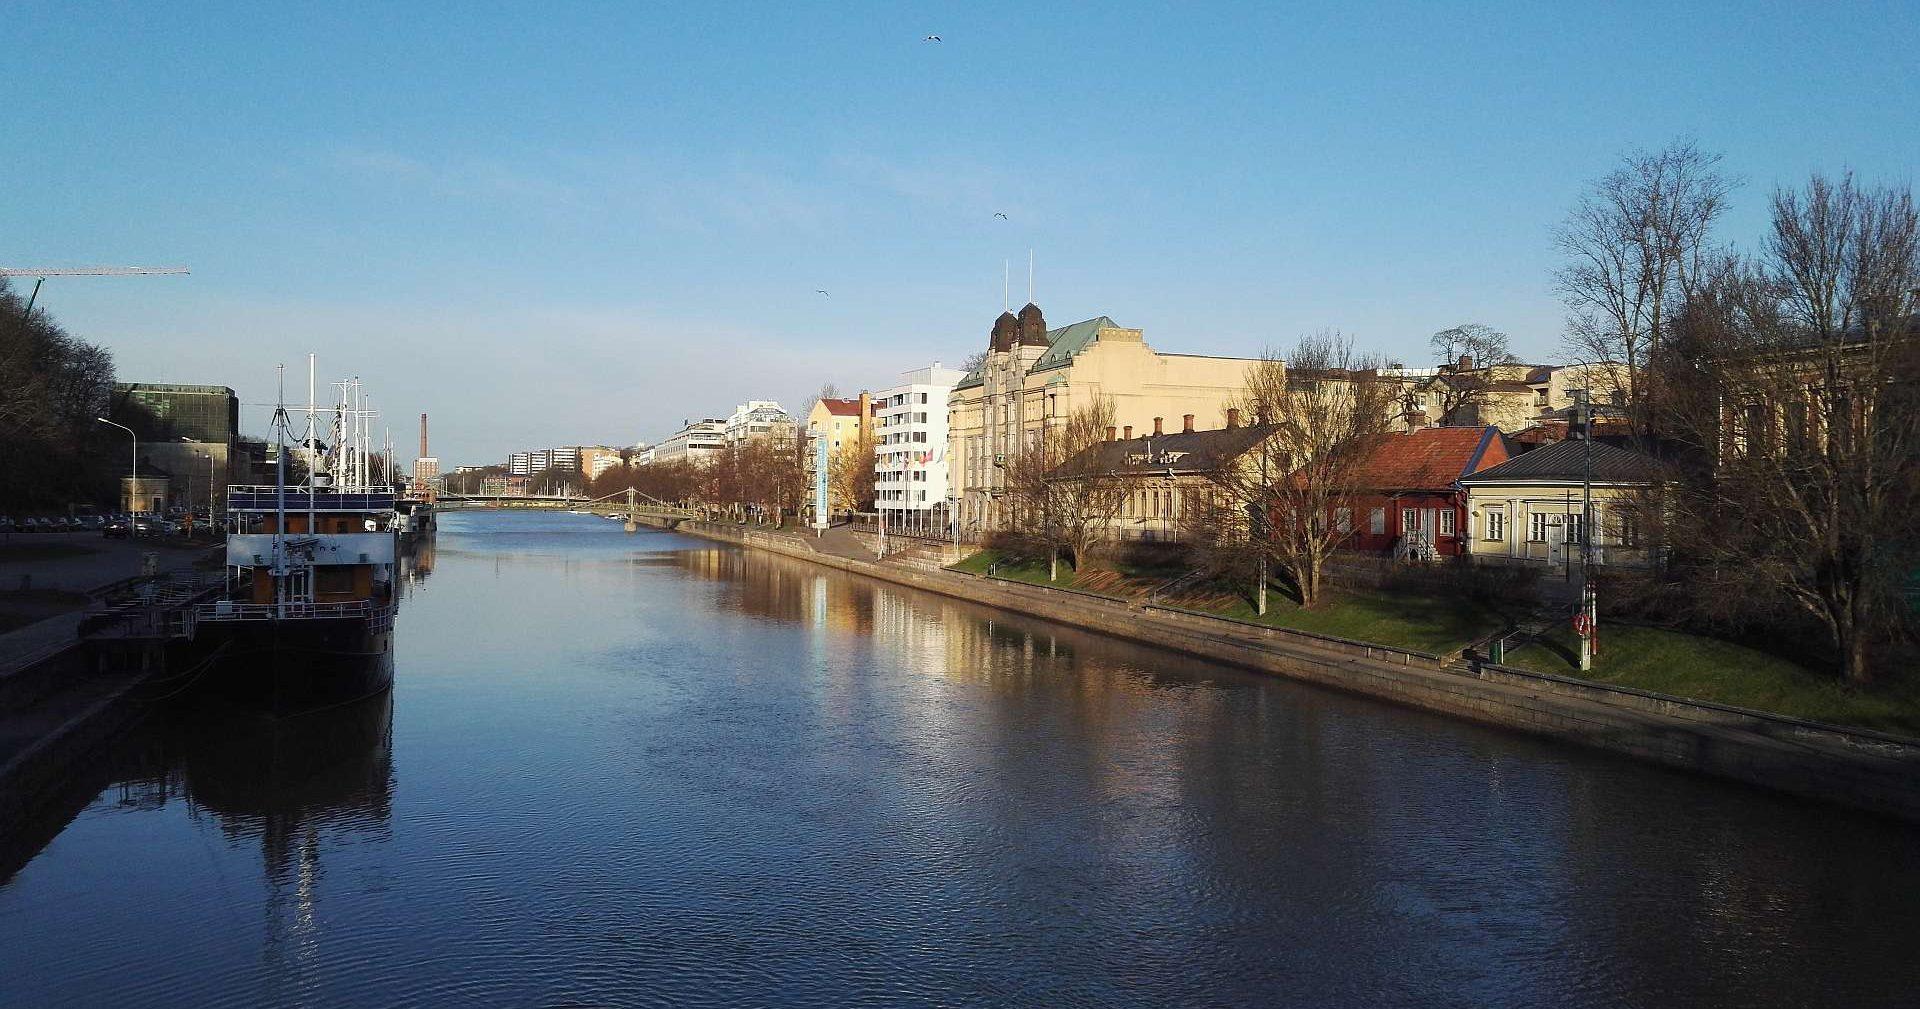 Te Palvelut Turku